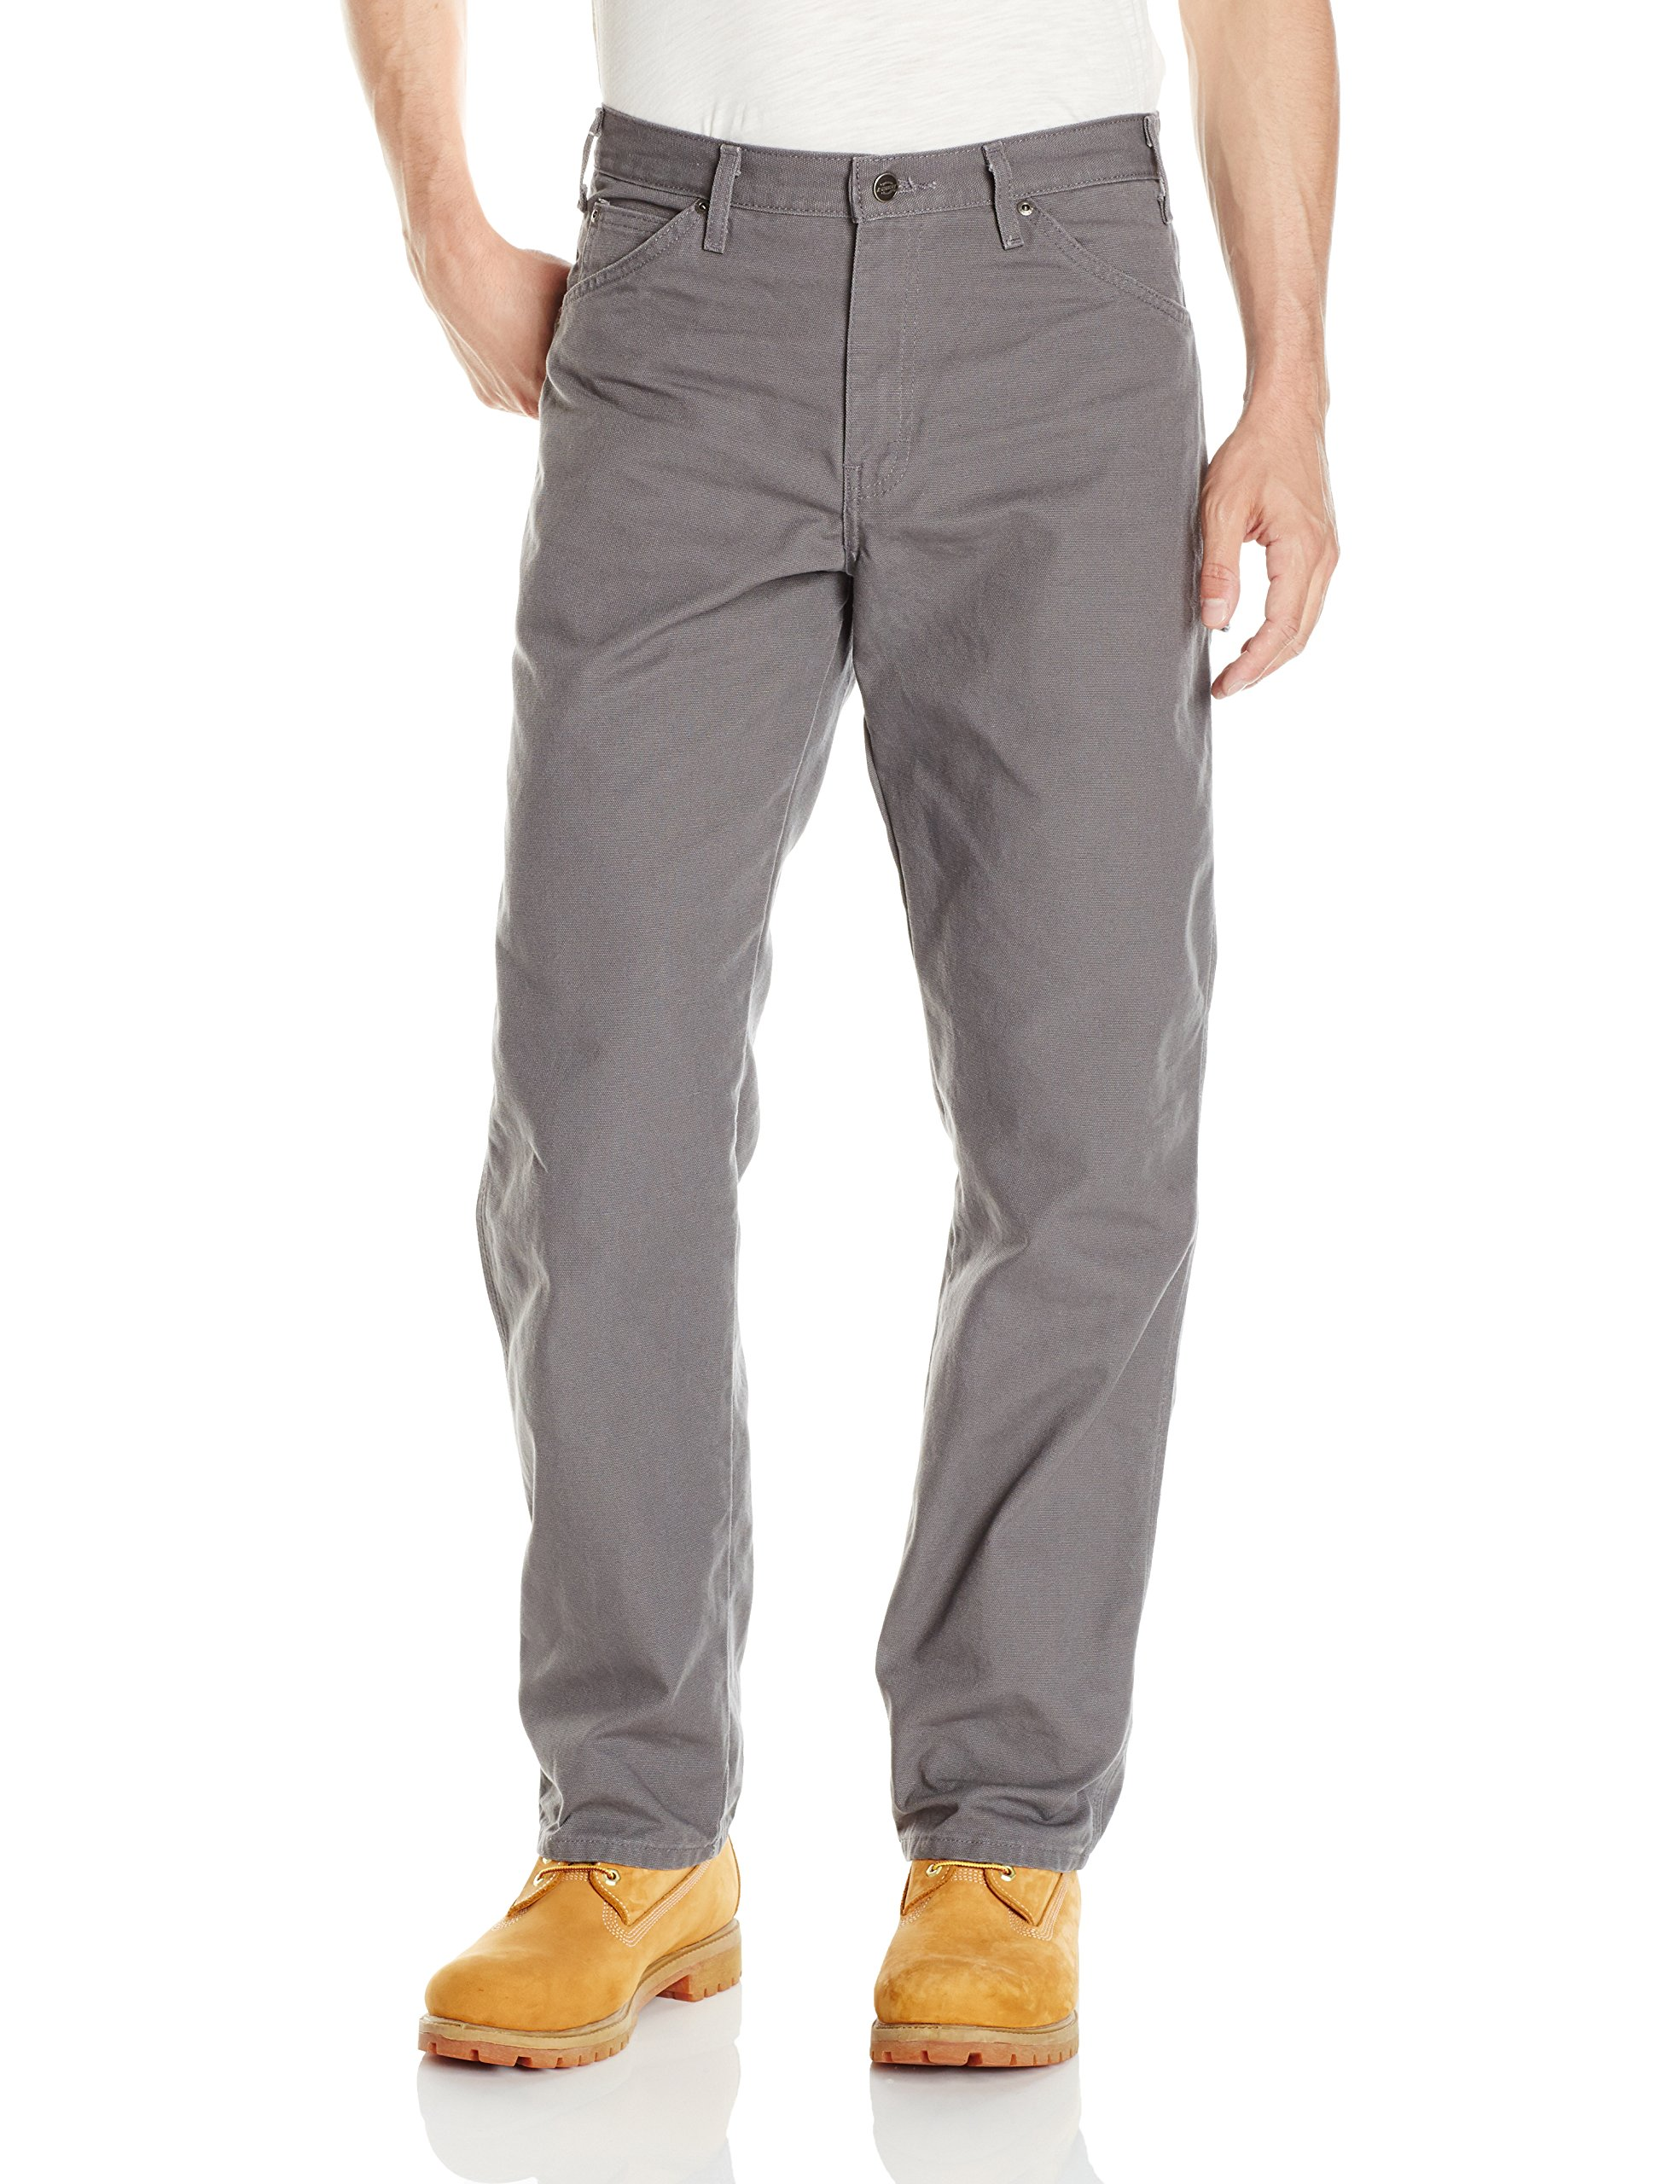 Dickies Men's Relaxed Fit Straight-Leg Duck Carpenter Jean, Slate, 34W x 32L